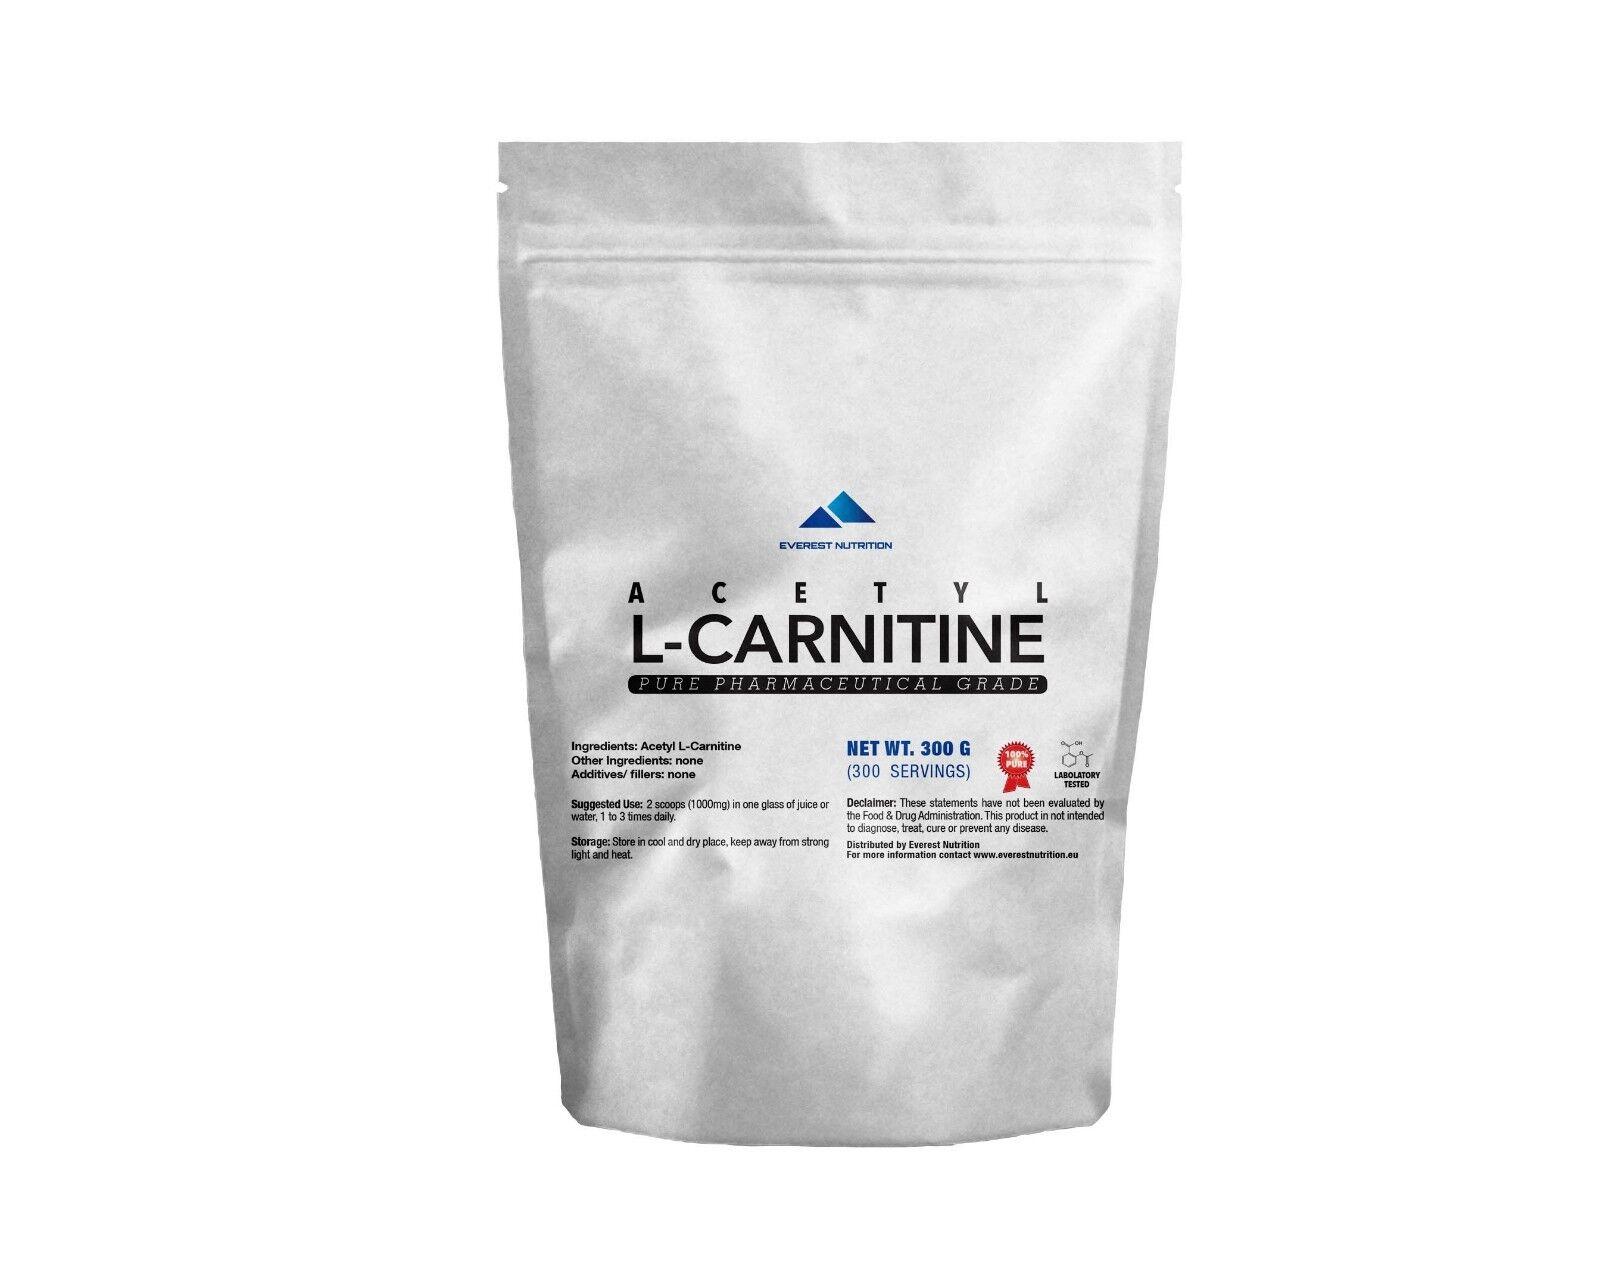 ACETYL L-CARNITINE ALCAR 100% PURE POWDER PREVENT STRESS STRESS PREVENT AND DEPRESSION FAT LOSS 618a4d